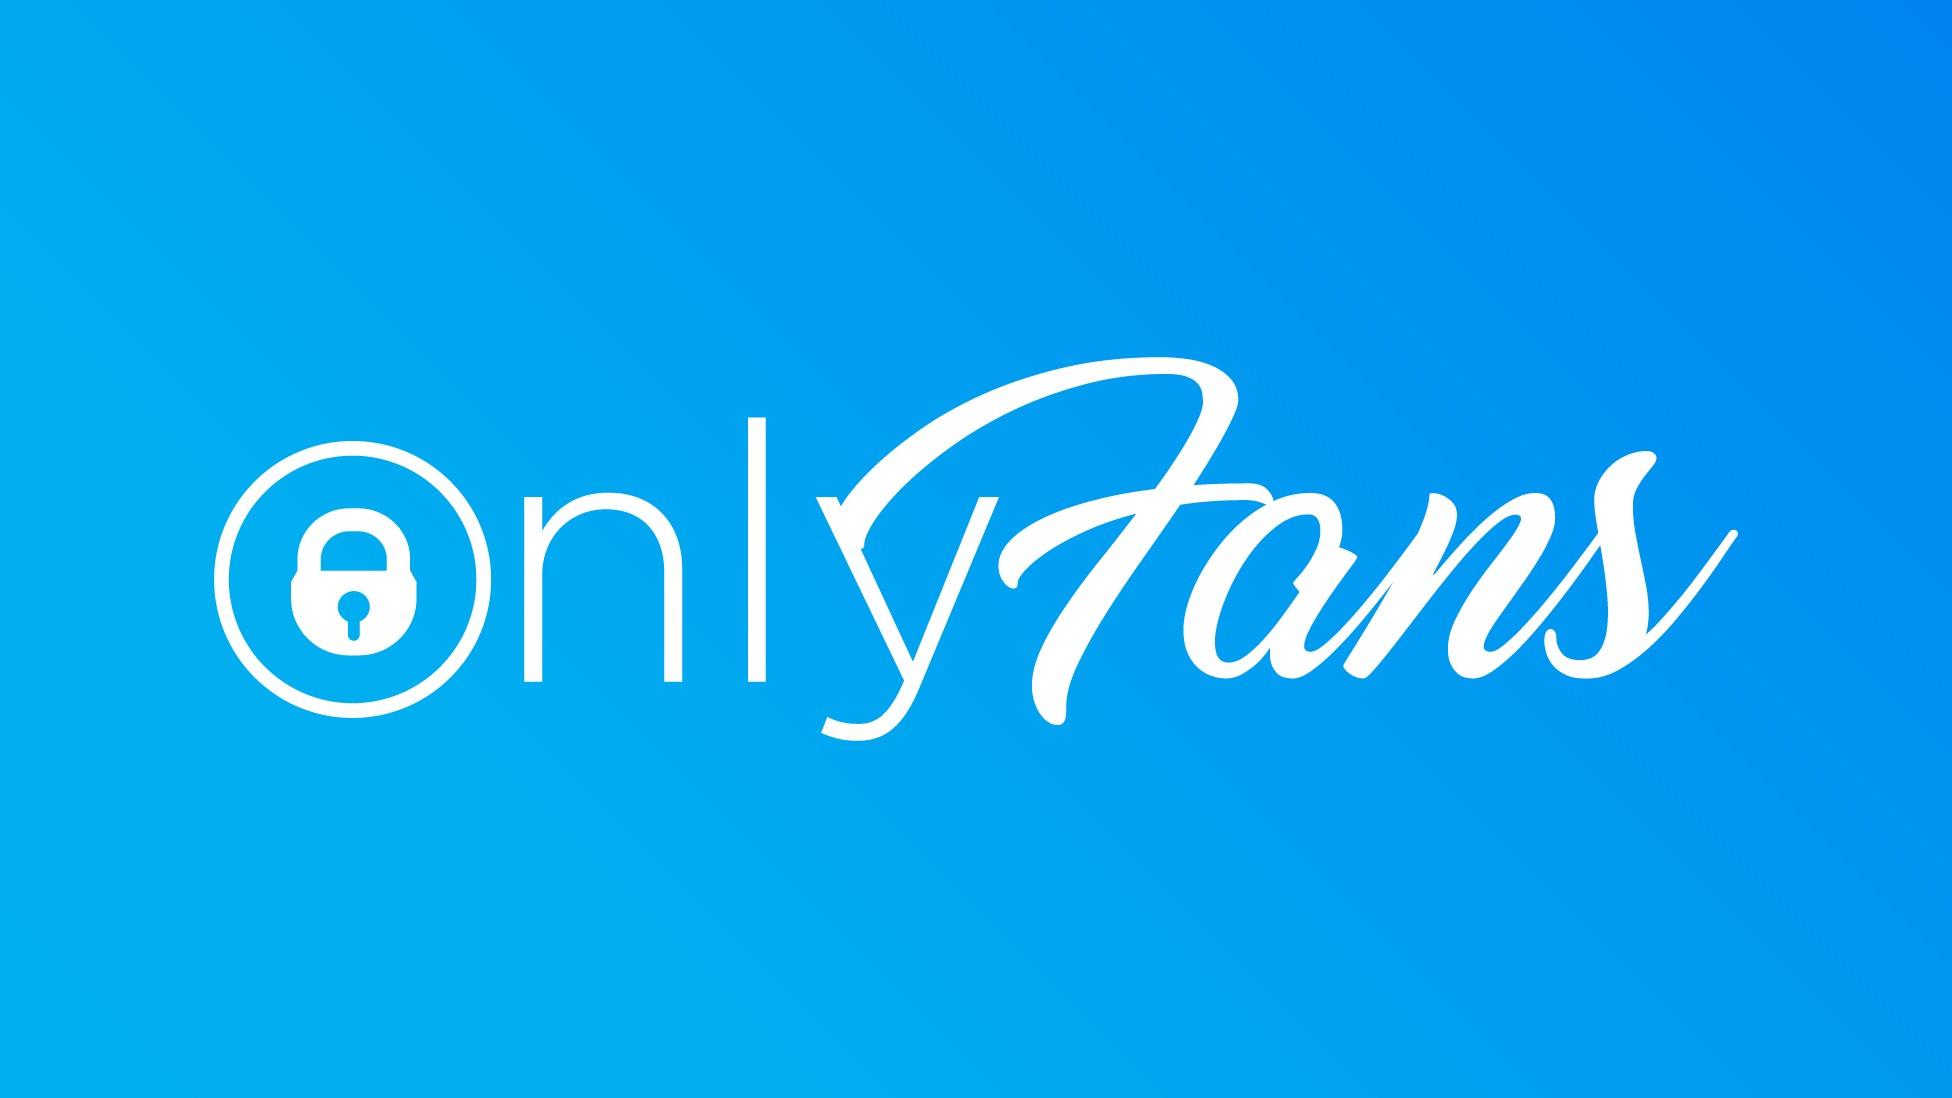 OnlyFans comptait 130 millions d'utilisateurs en 2020. Image : OnlyFans